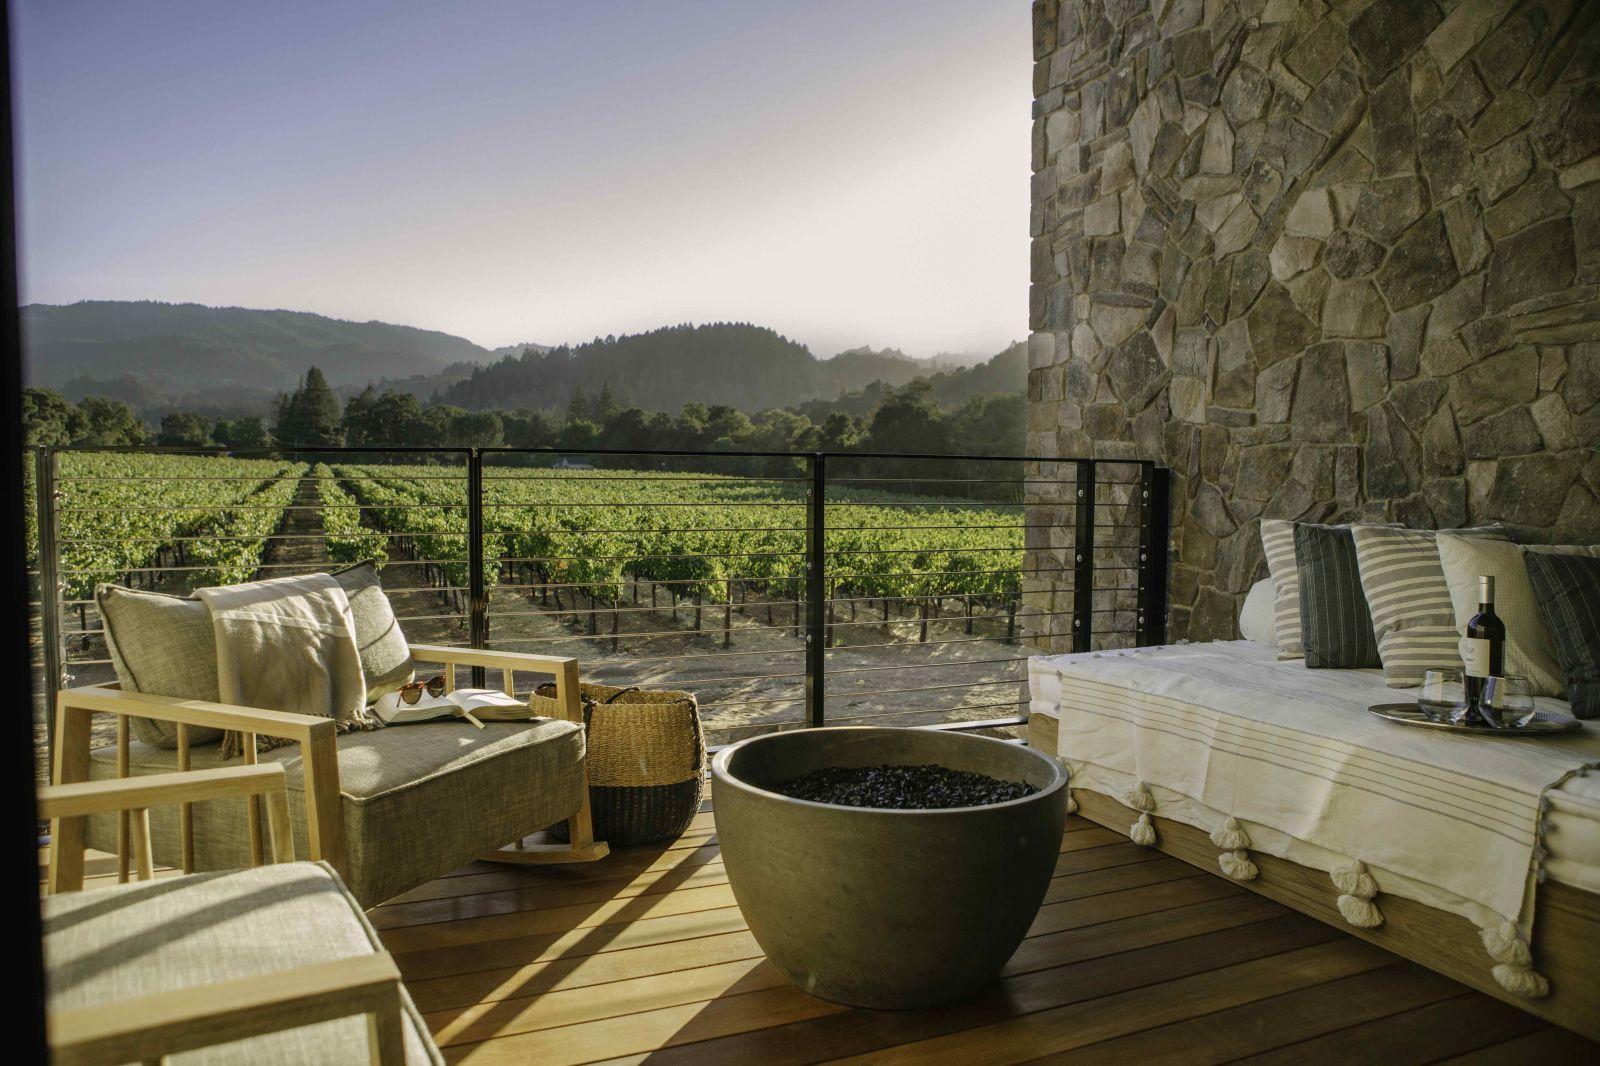 T C Travel Guide Napa Valley And Sonoma County California Hotels In Napa Visiting Napa Napa Valley Hotels